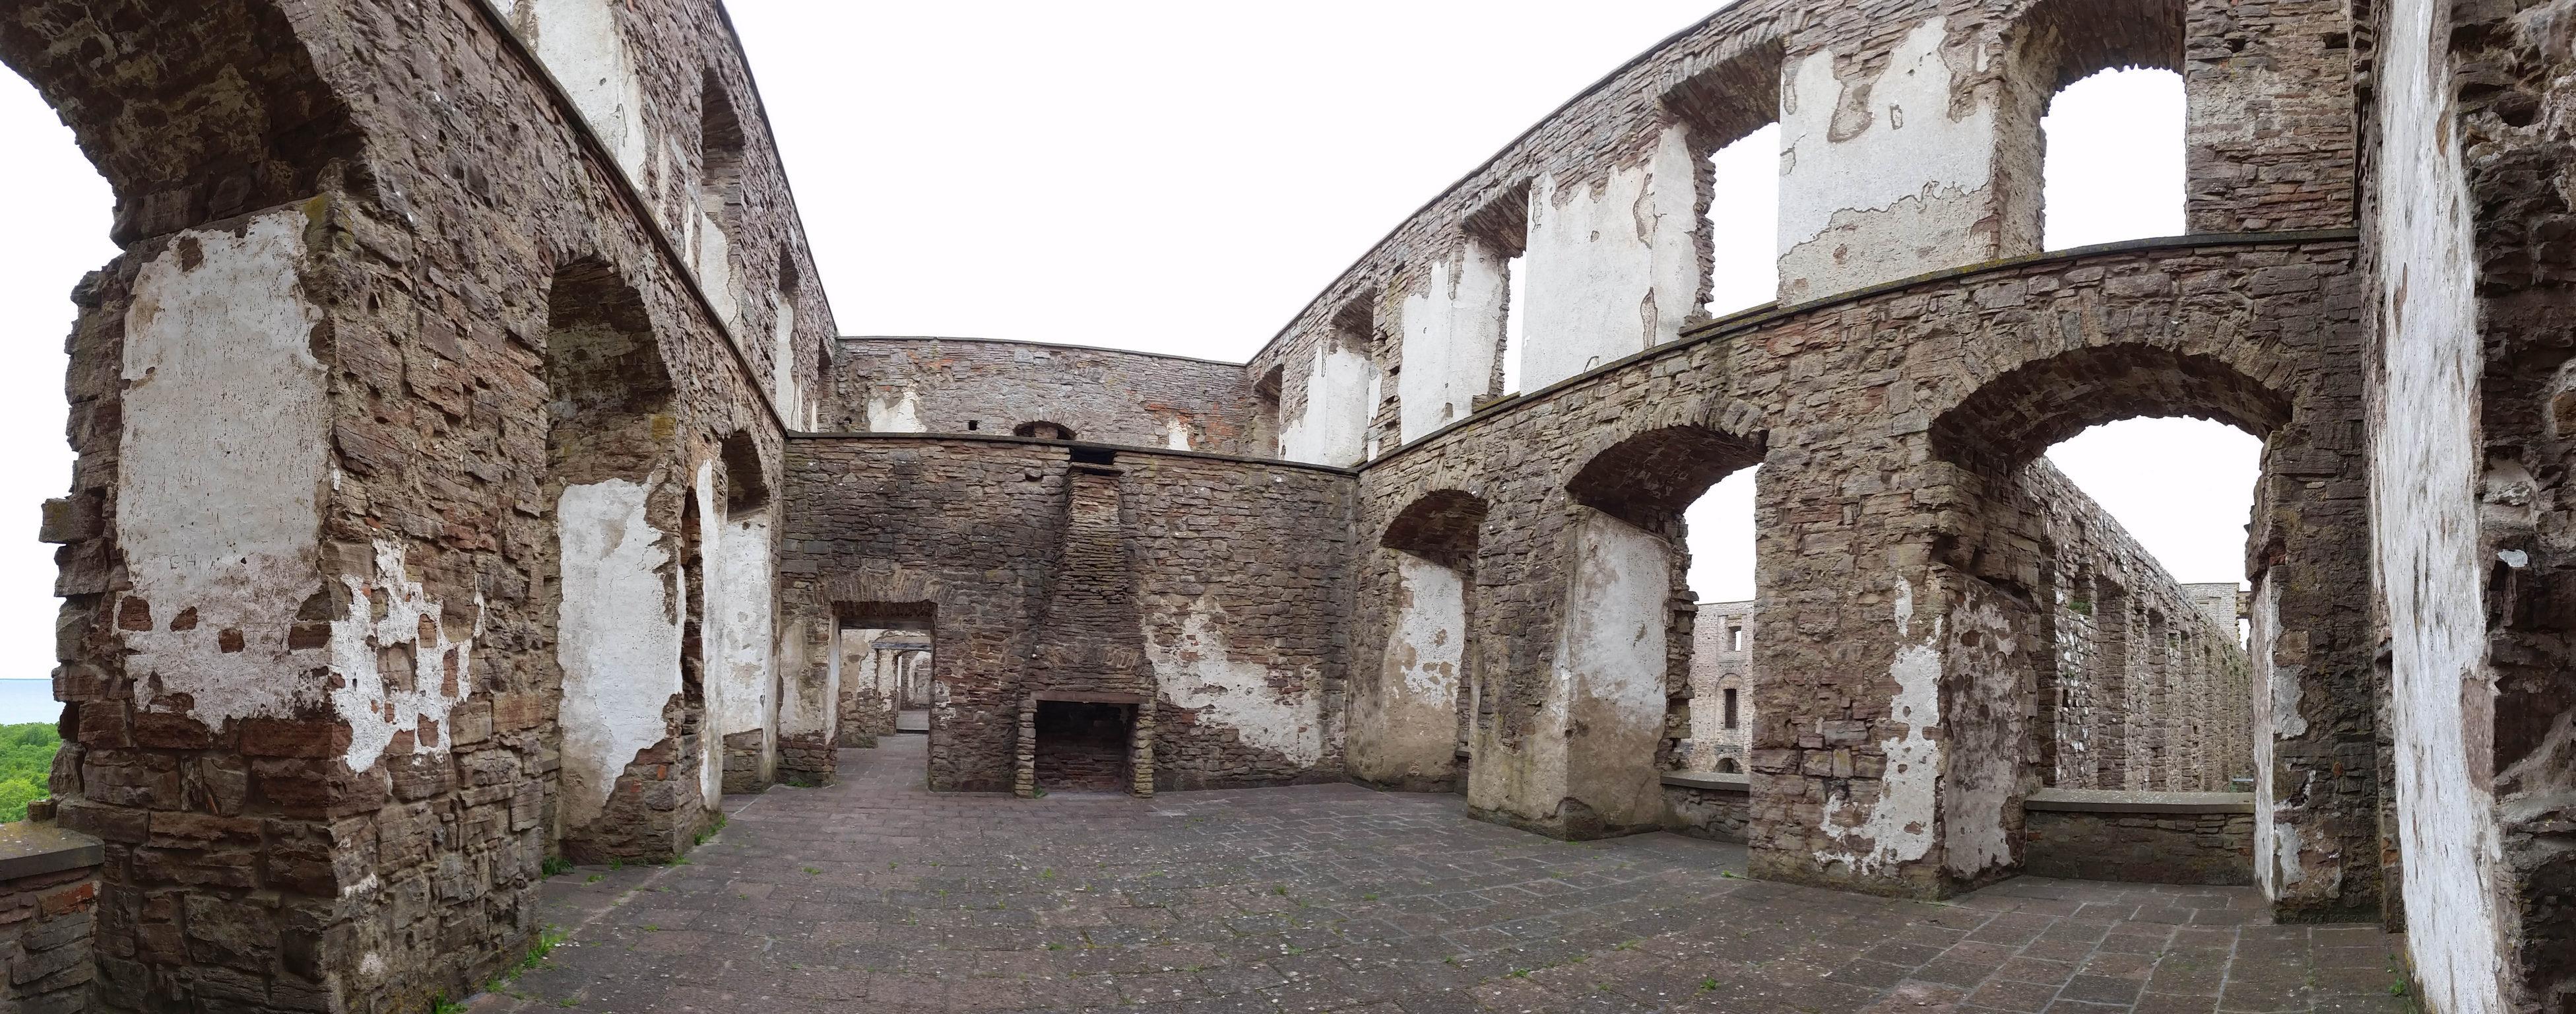 Schloss Borgholm